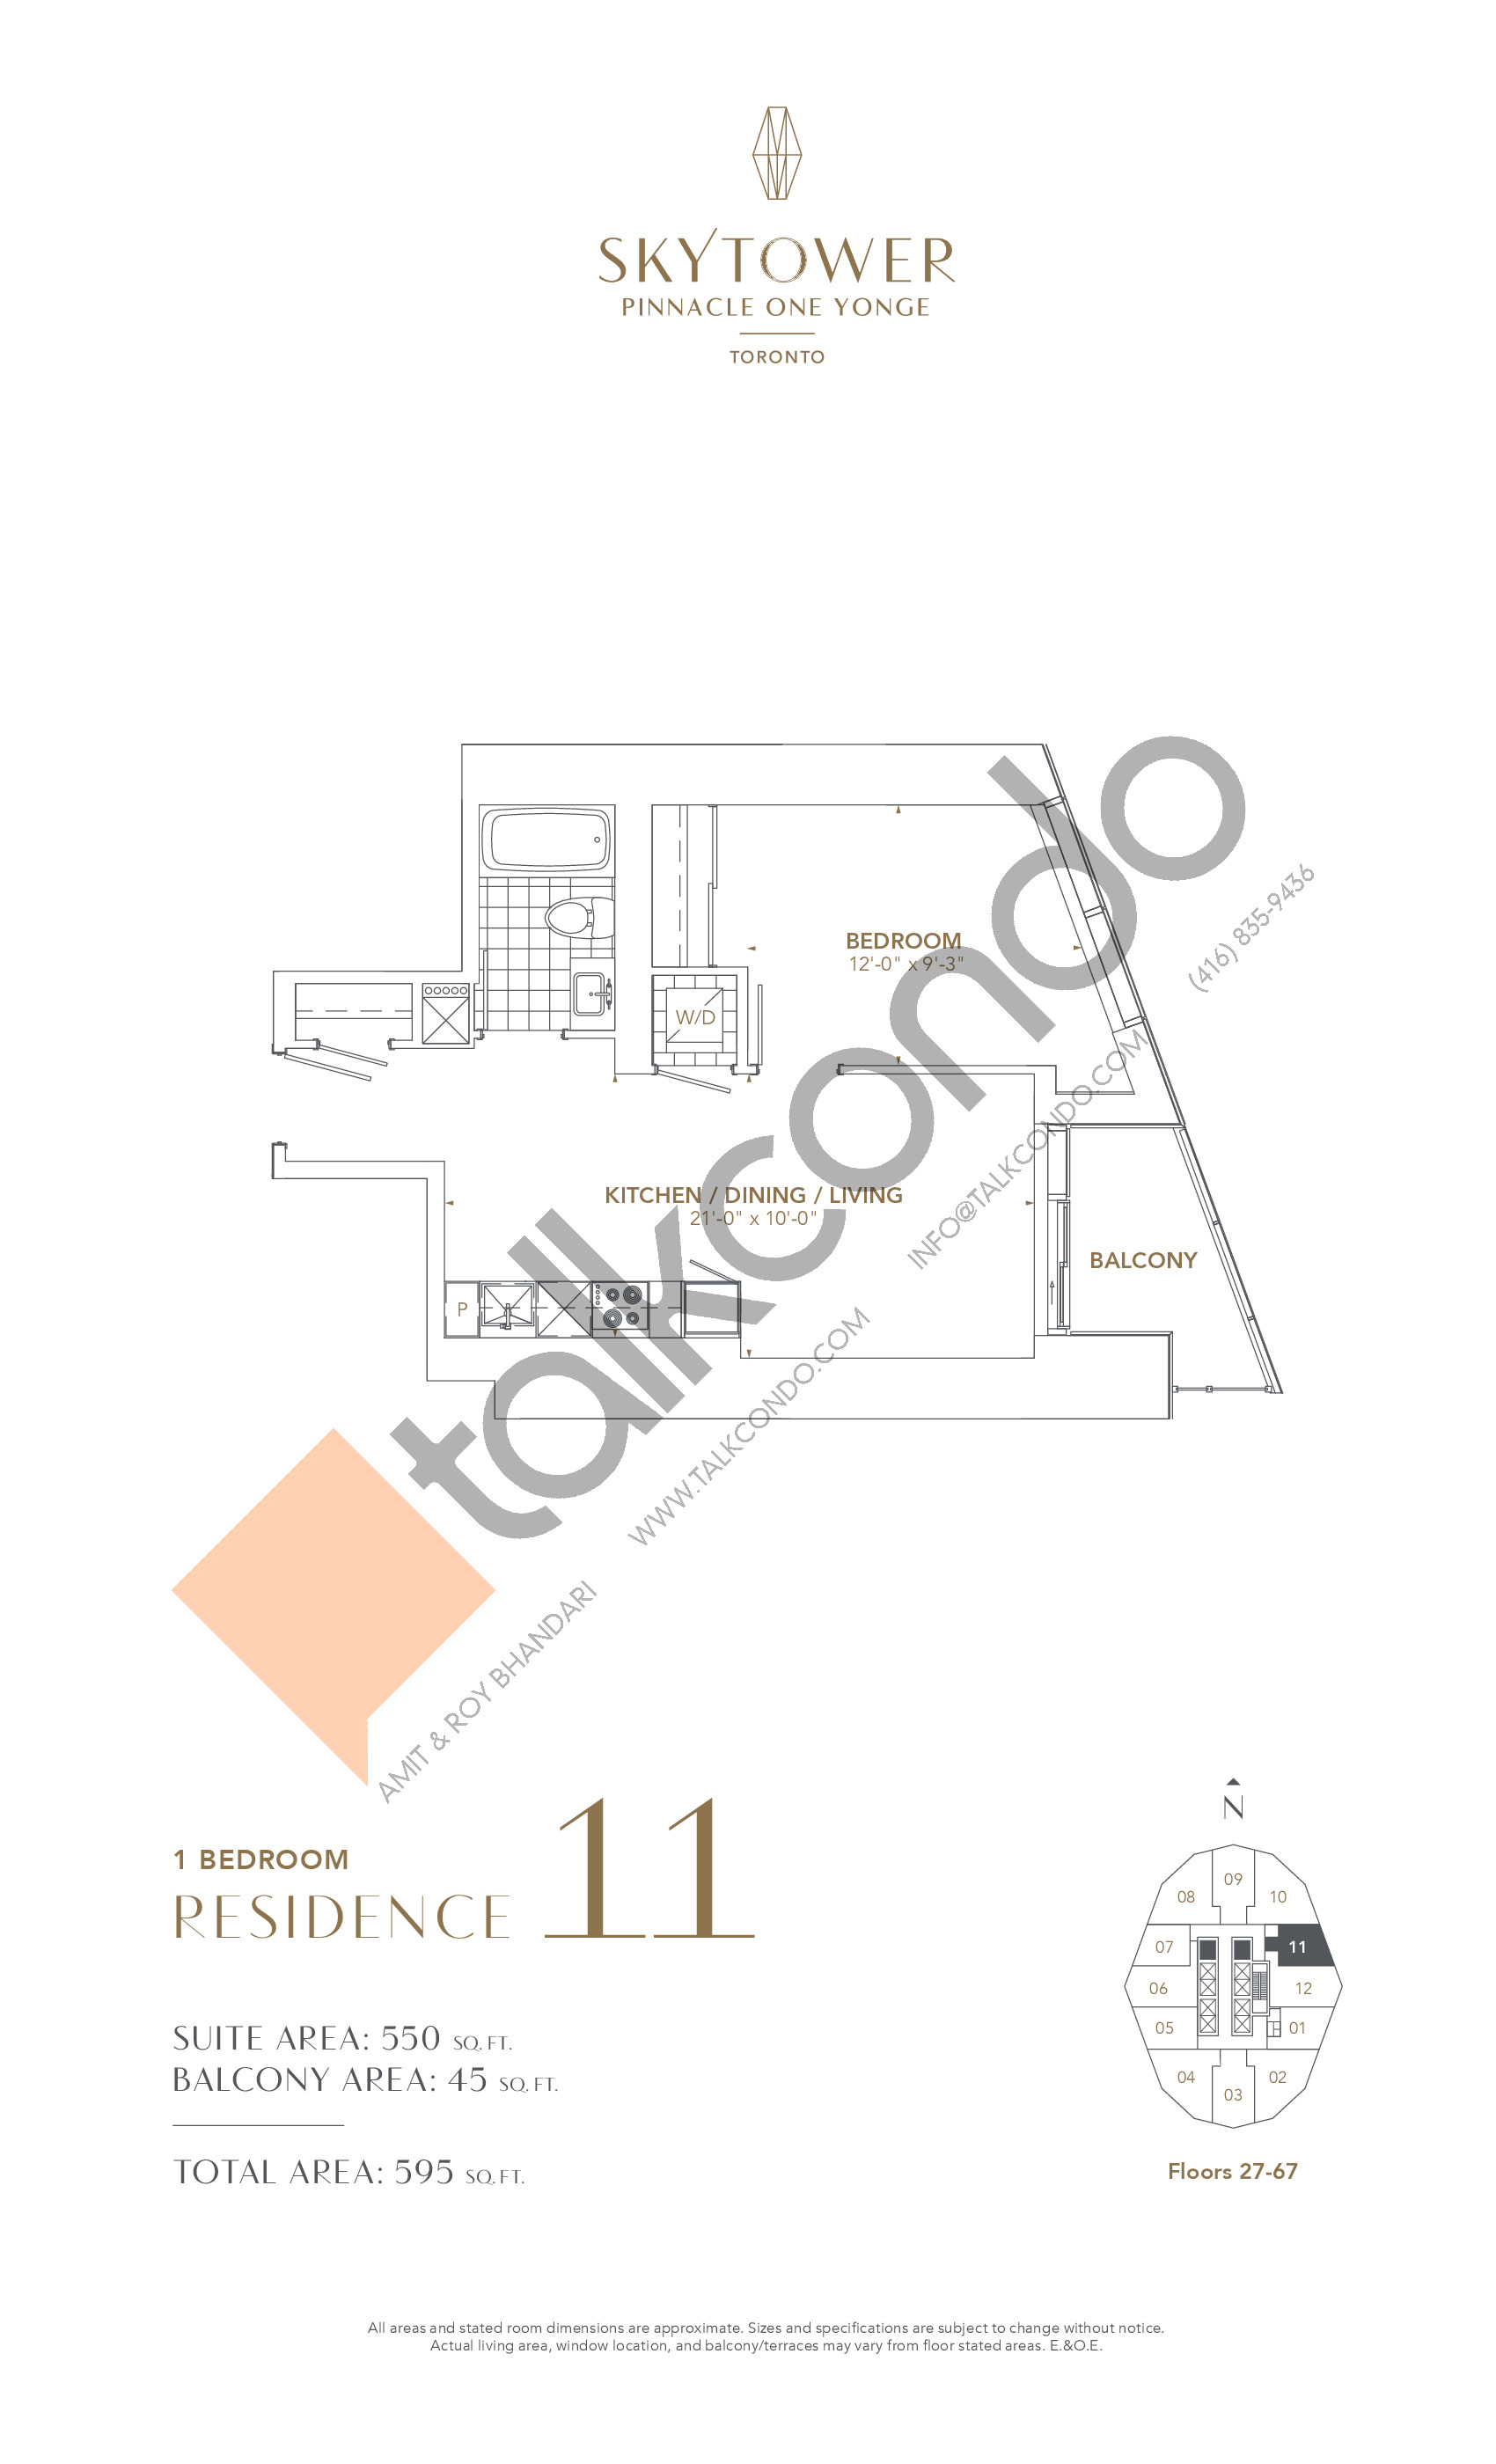 Residence 11 Floor Plan at SkyTower at Pinnacle One Yonge - 550 sq.ft